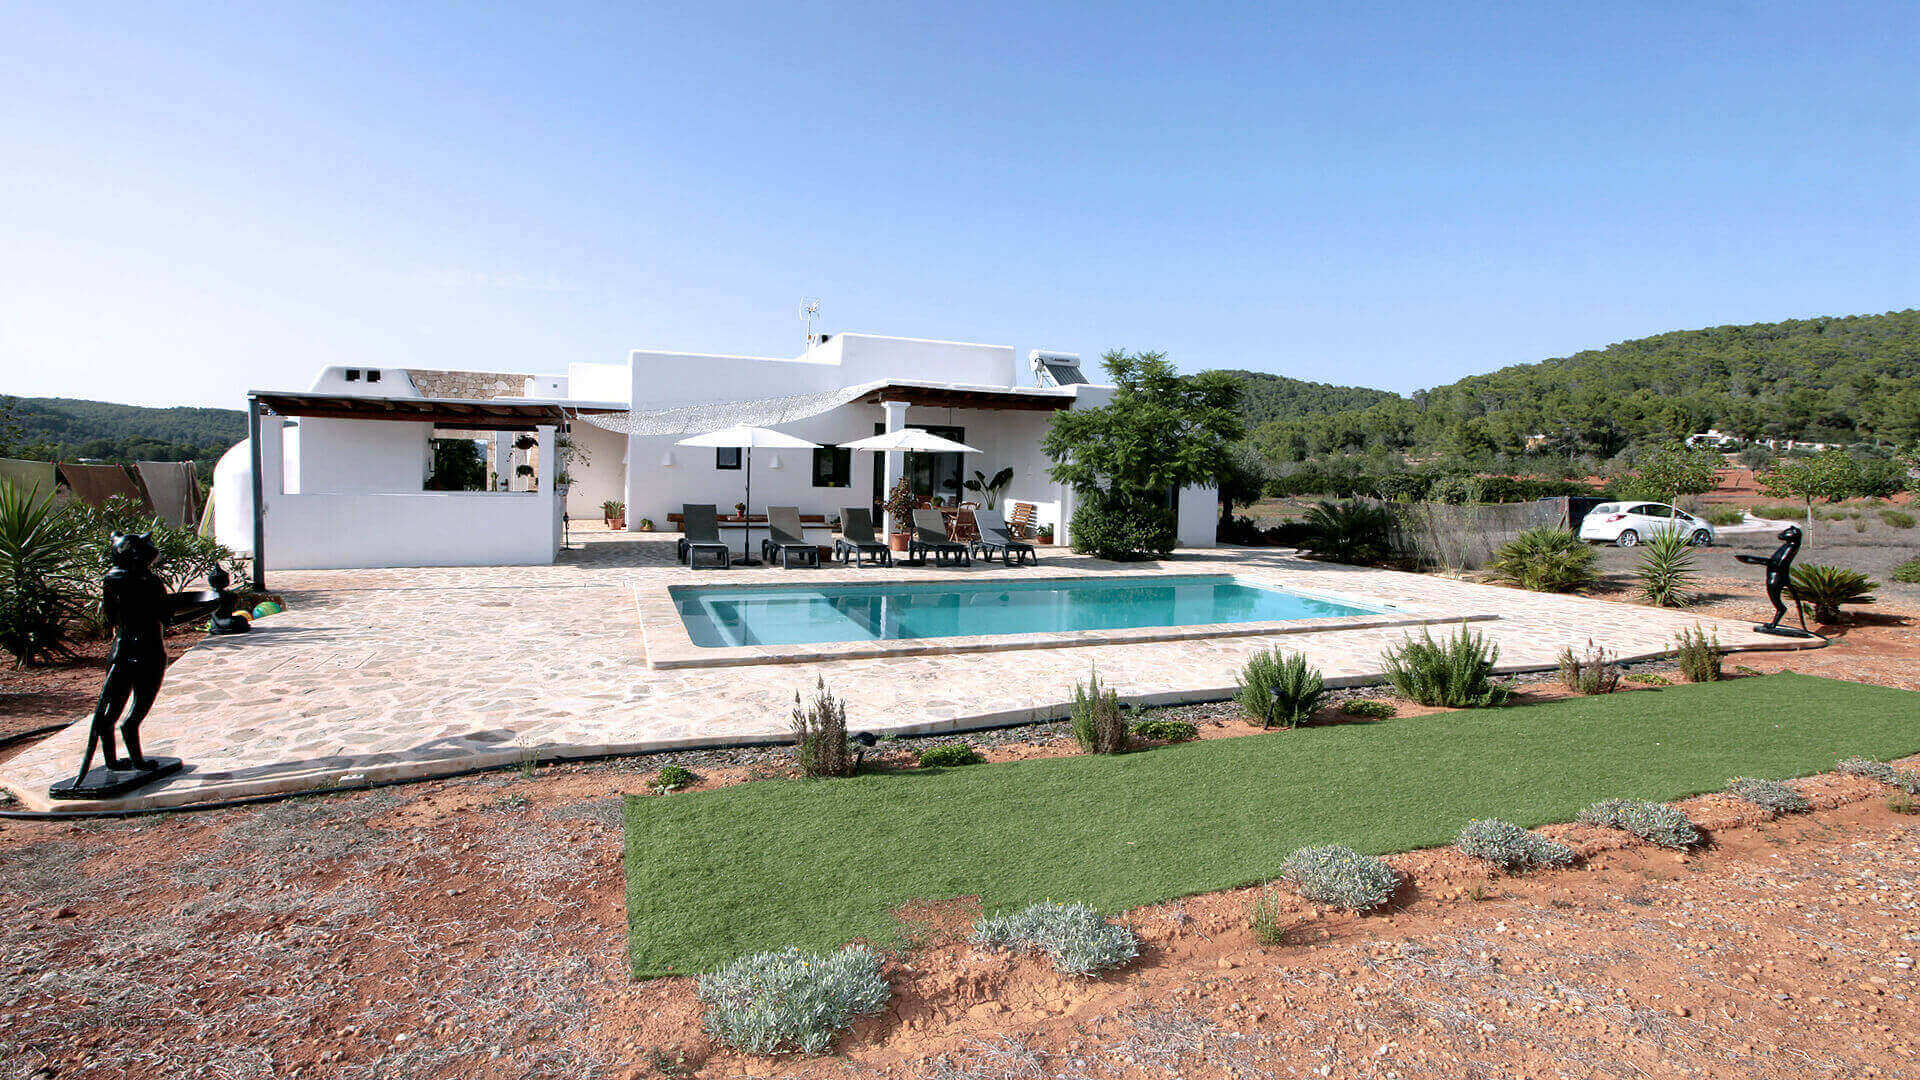 Cana Marieta Ibiza Villa 3 Near San Miguel